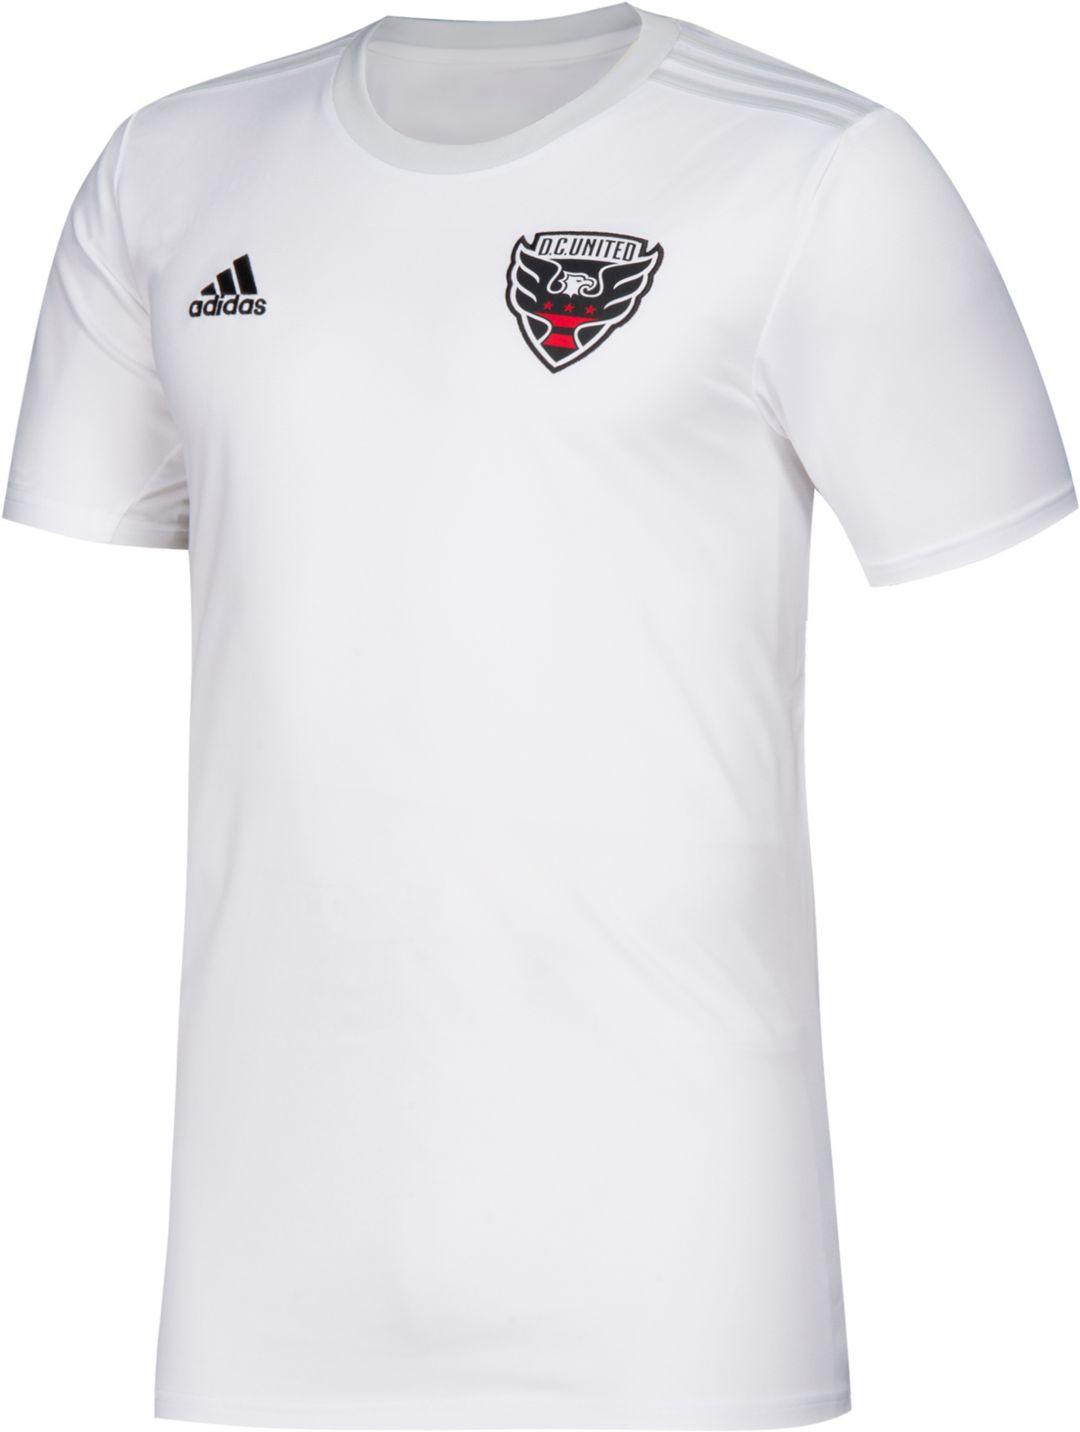 newest 0f6d6 543ef adidas Men's D.C. United Secondary Replica Jersey